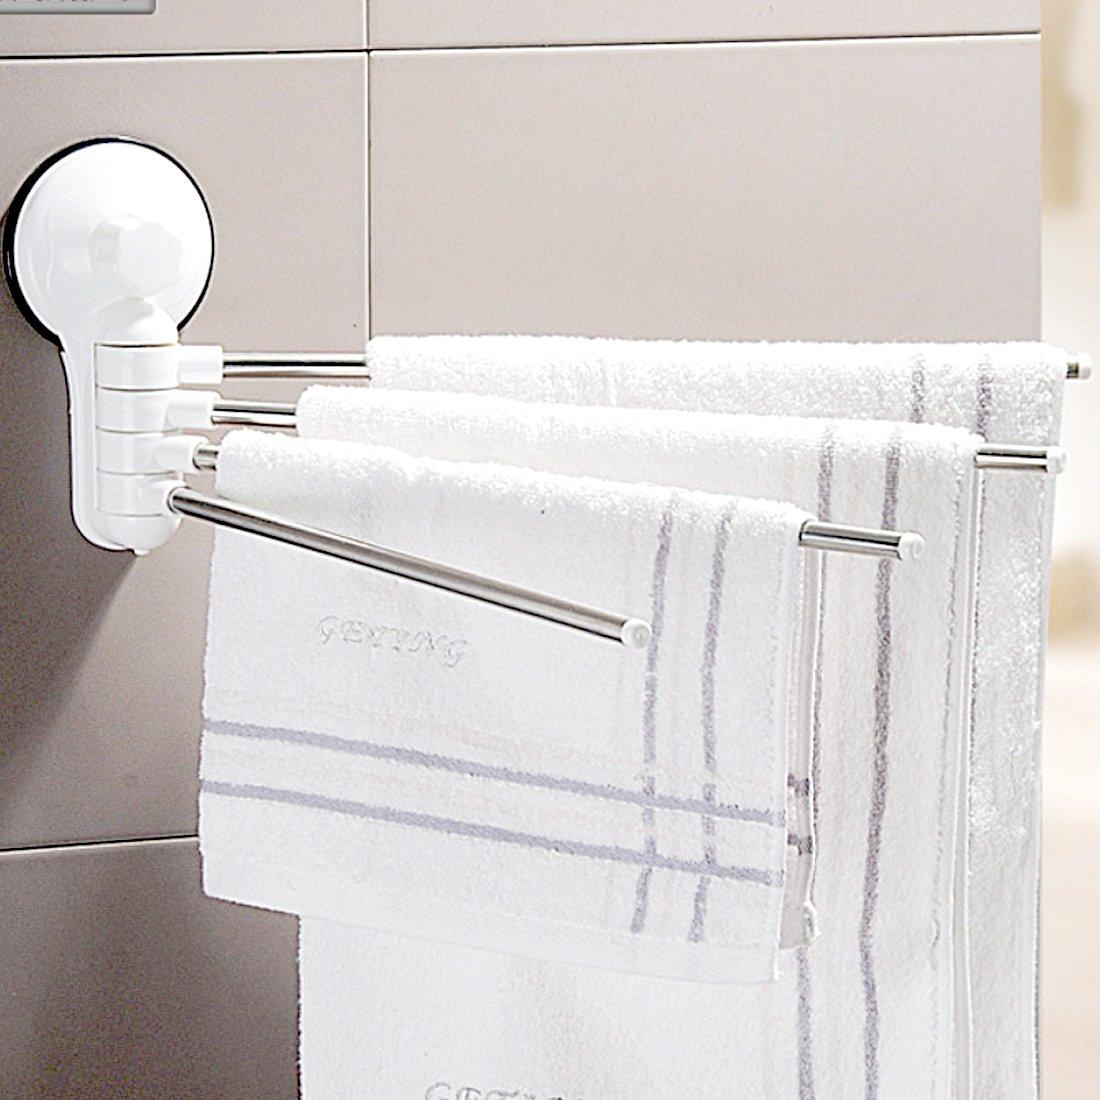 YOMYM 180 ° Rotating Swing Arm Towel Bar Stainless Steel Sucker 4-bar Hotel Towel Rack